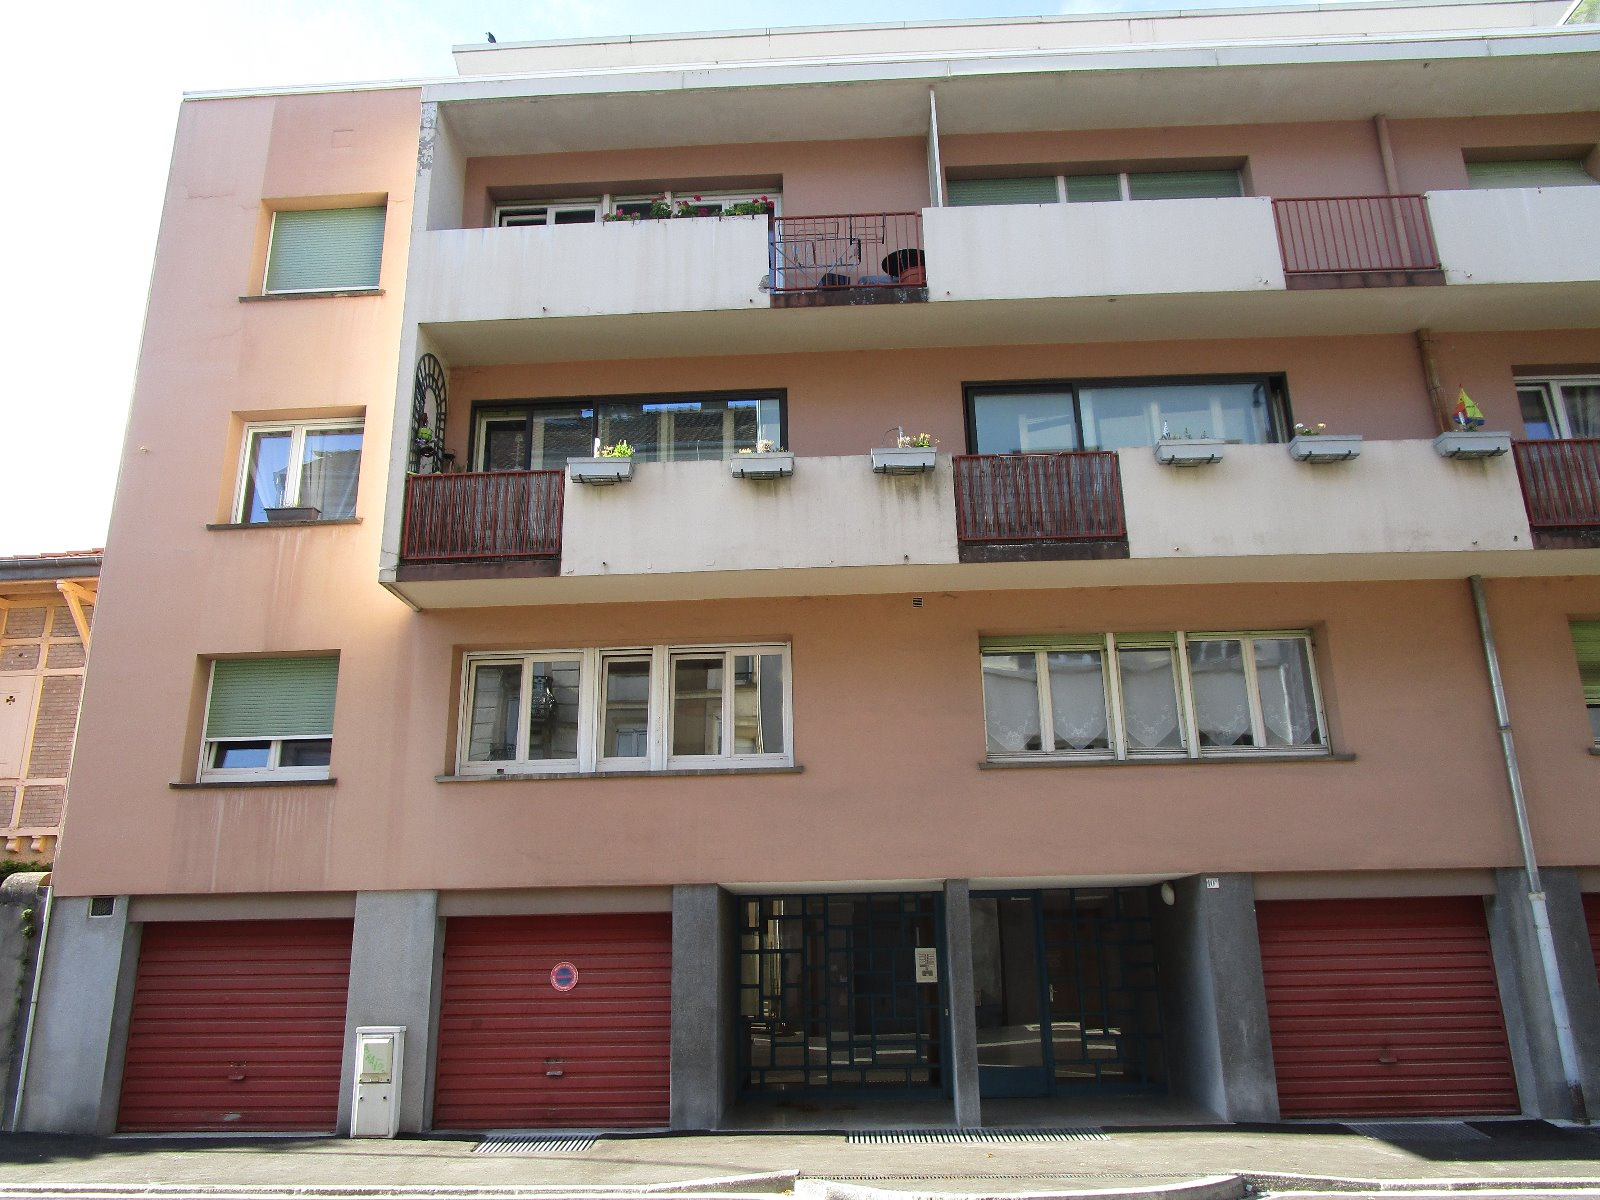 Location appartement belfort et ses environs studio 2 for Location appartement bordeaux et ses environs